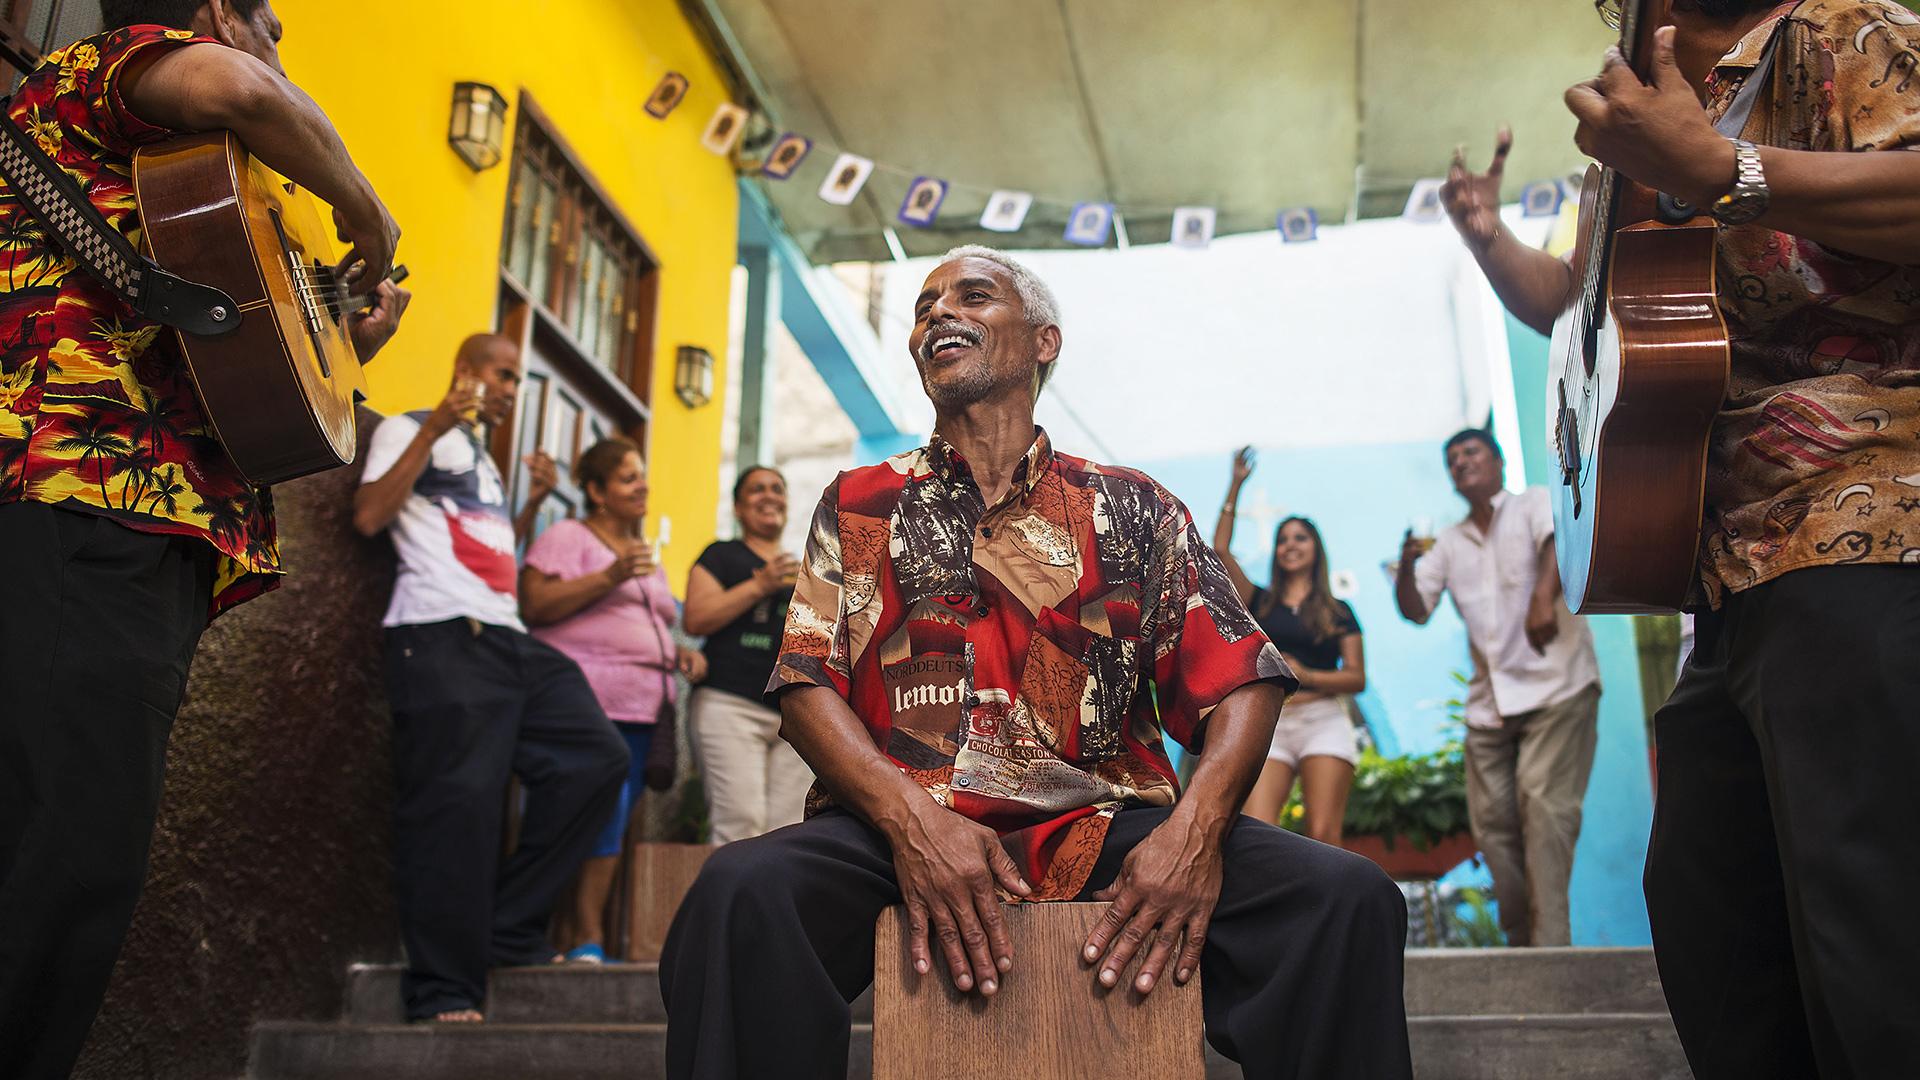 Día de la Canción Criolla: 7 datos curiosos - Revista Sommelier